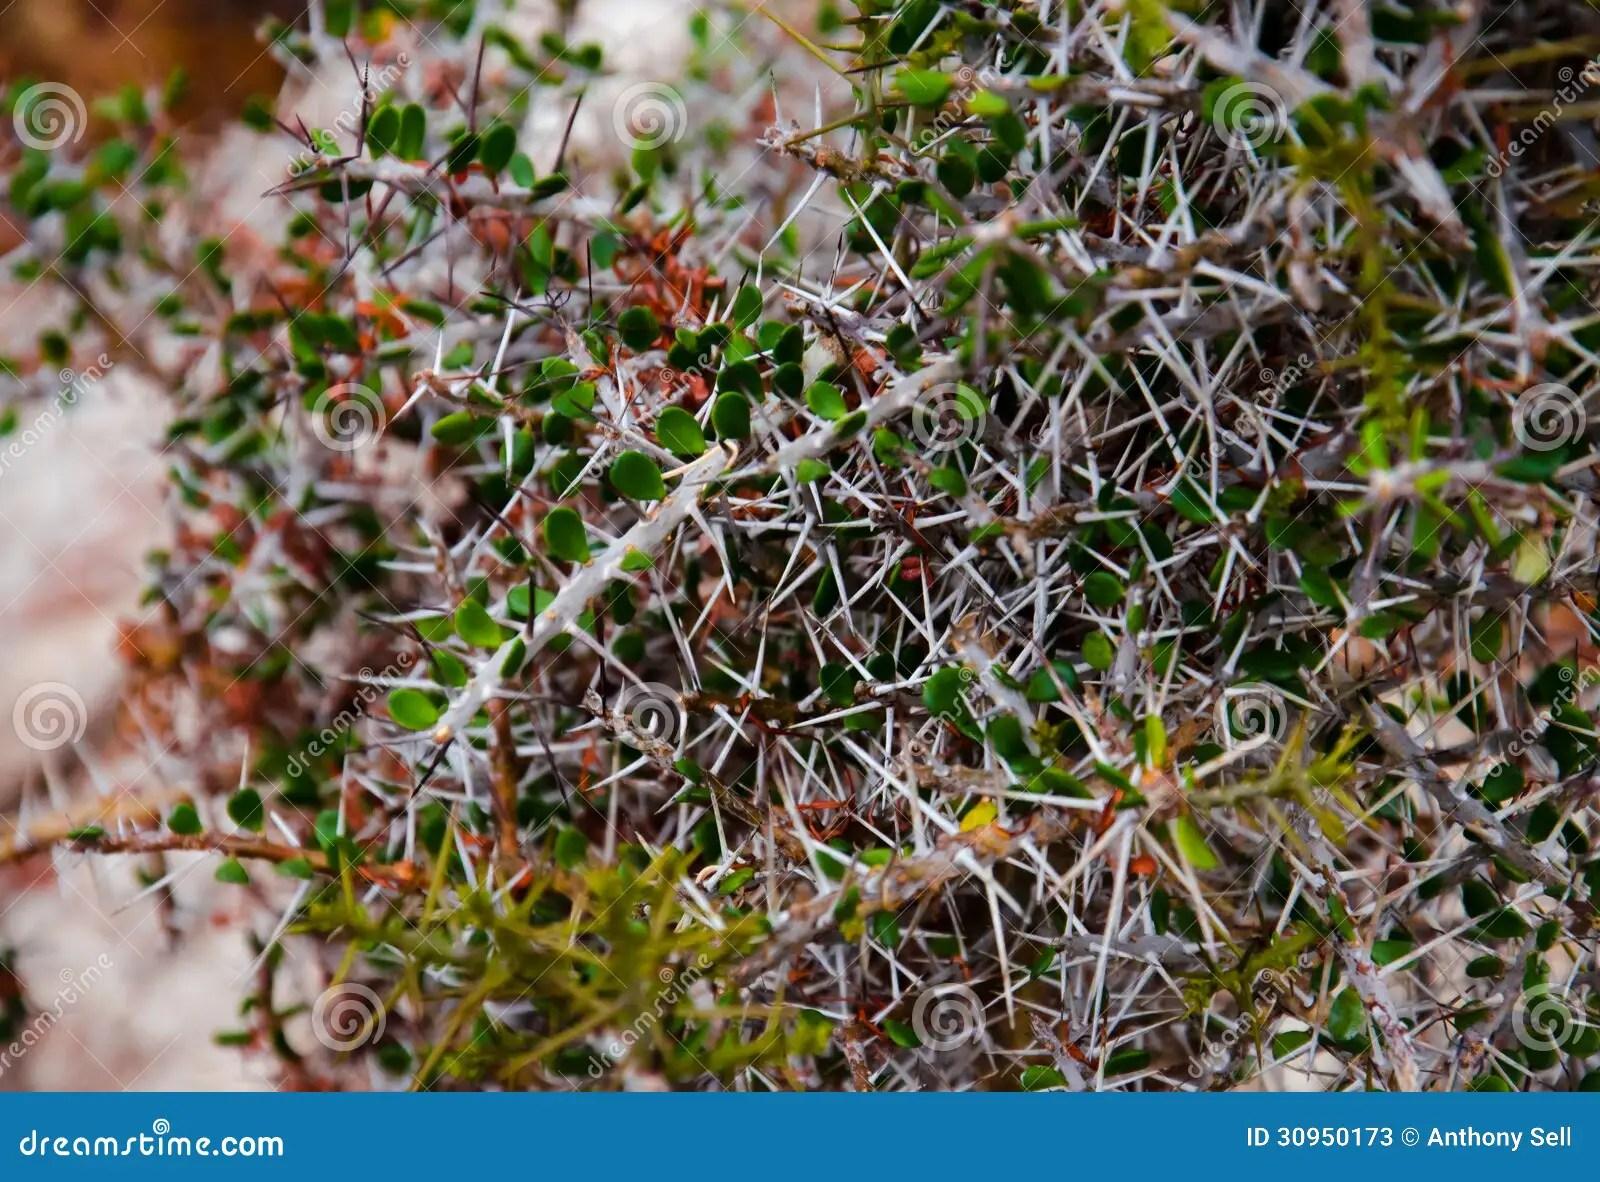 Desert Thorns Stock Image Image Of Twigs Stems Floor